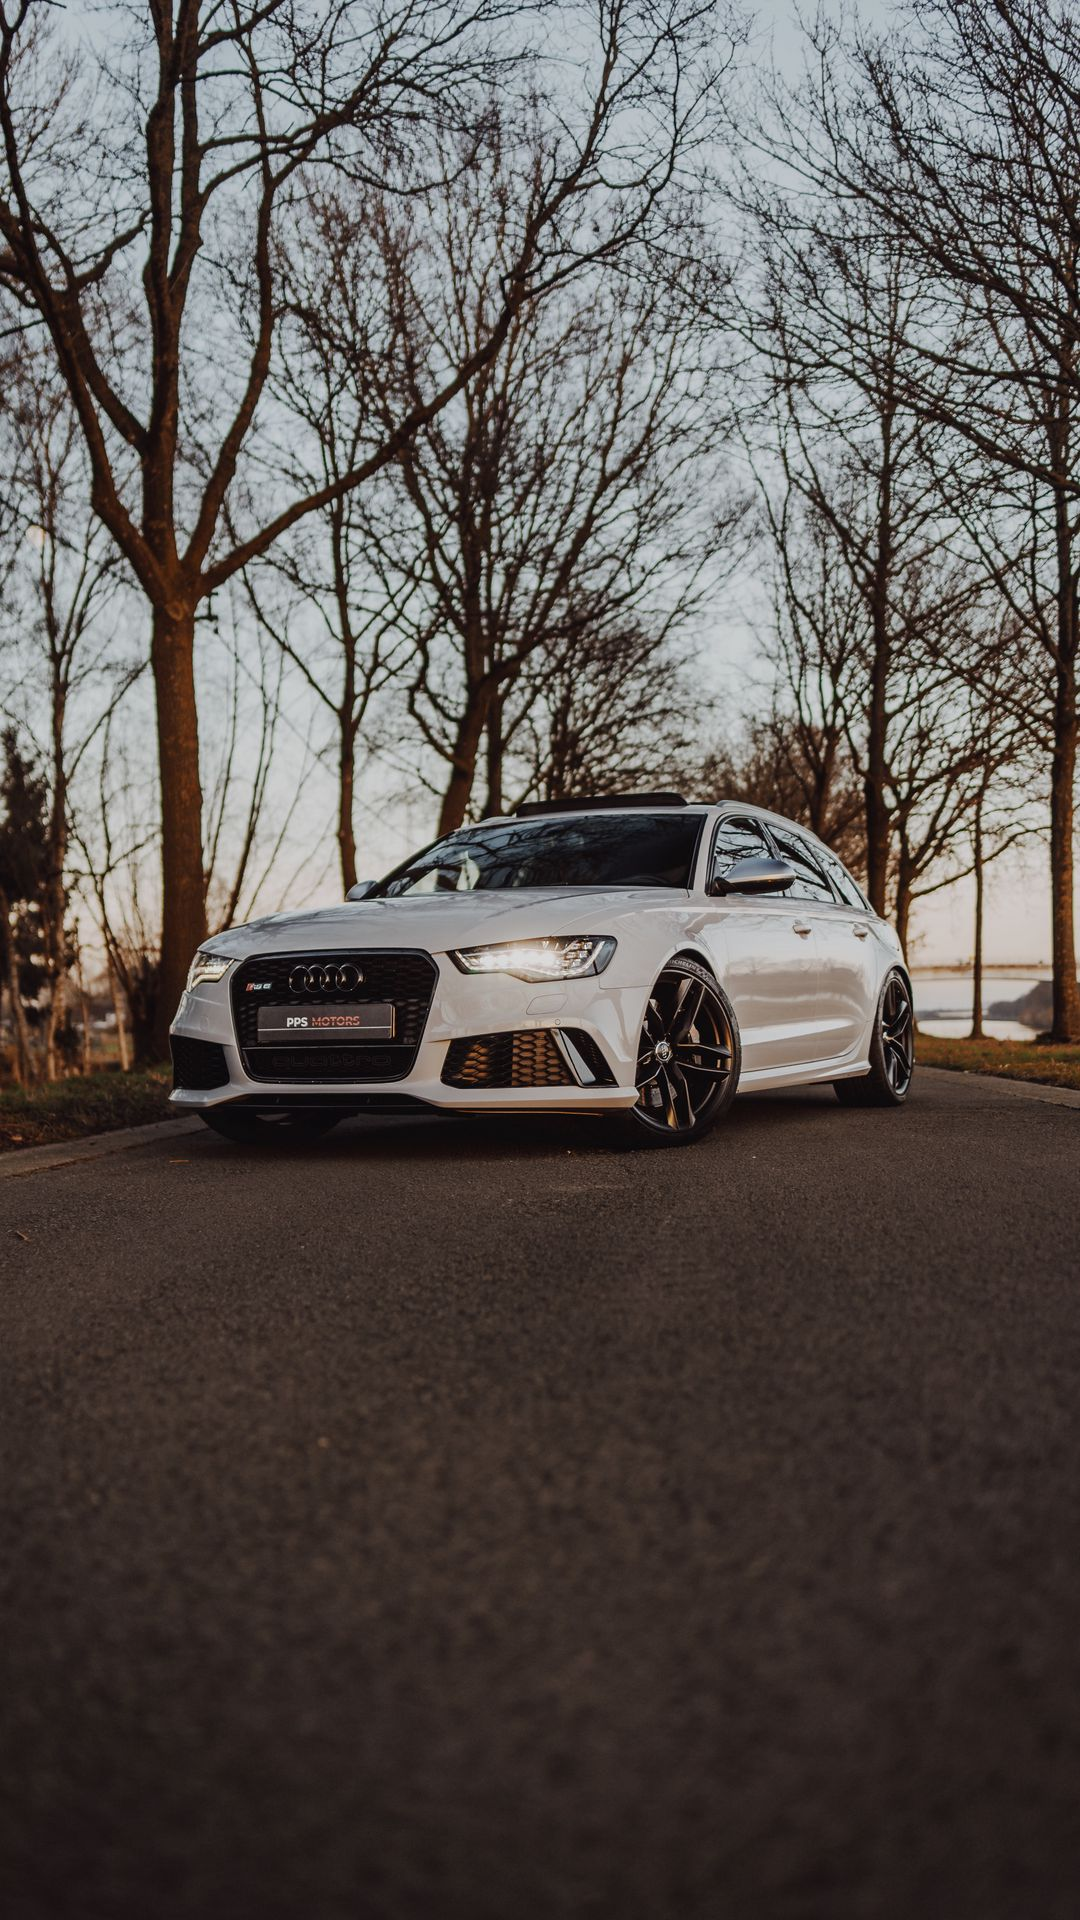 Audi Stok Car Wallpapers Free Download